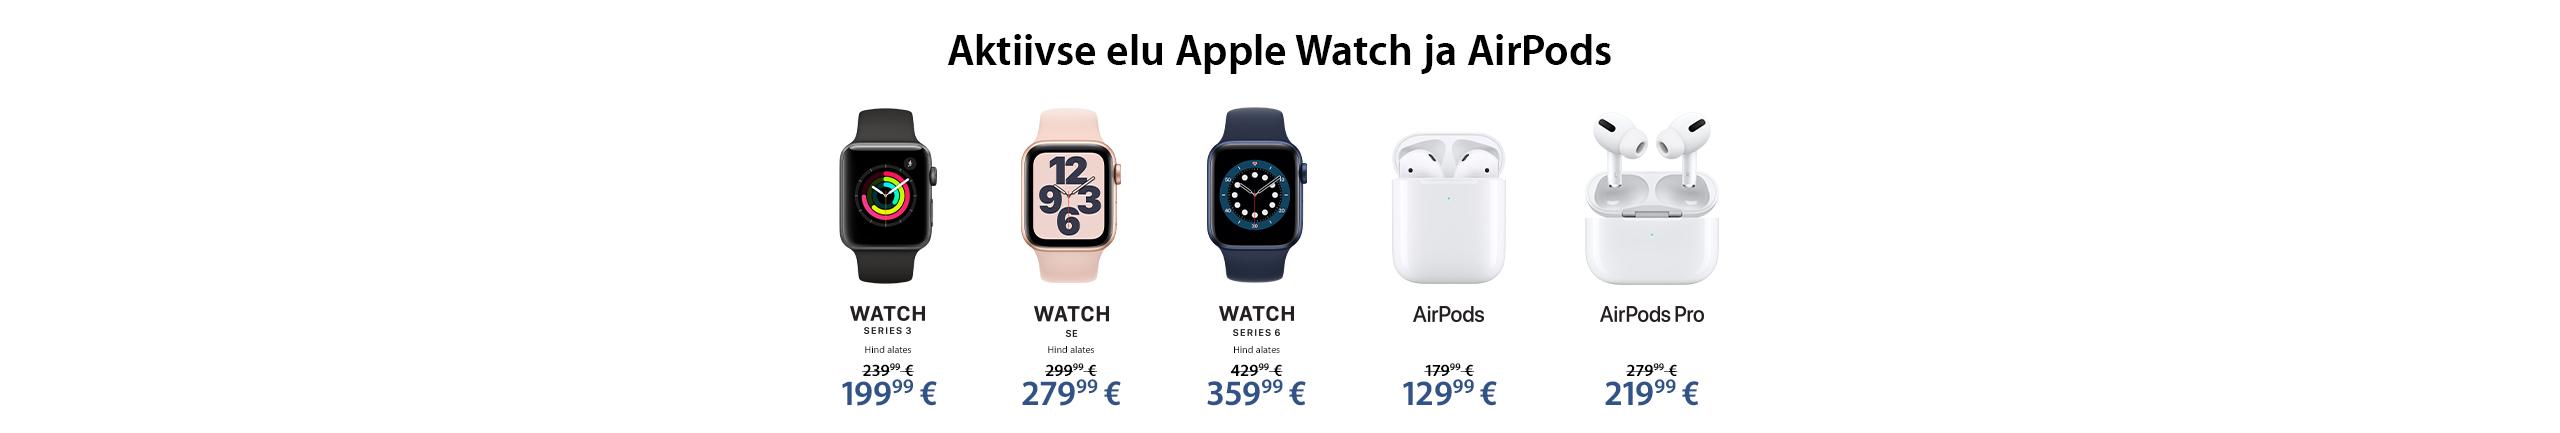 NPL Aktiivse elu Apple Watch ja AirPods